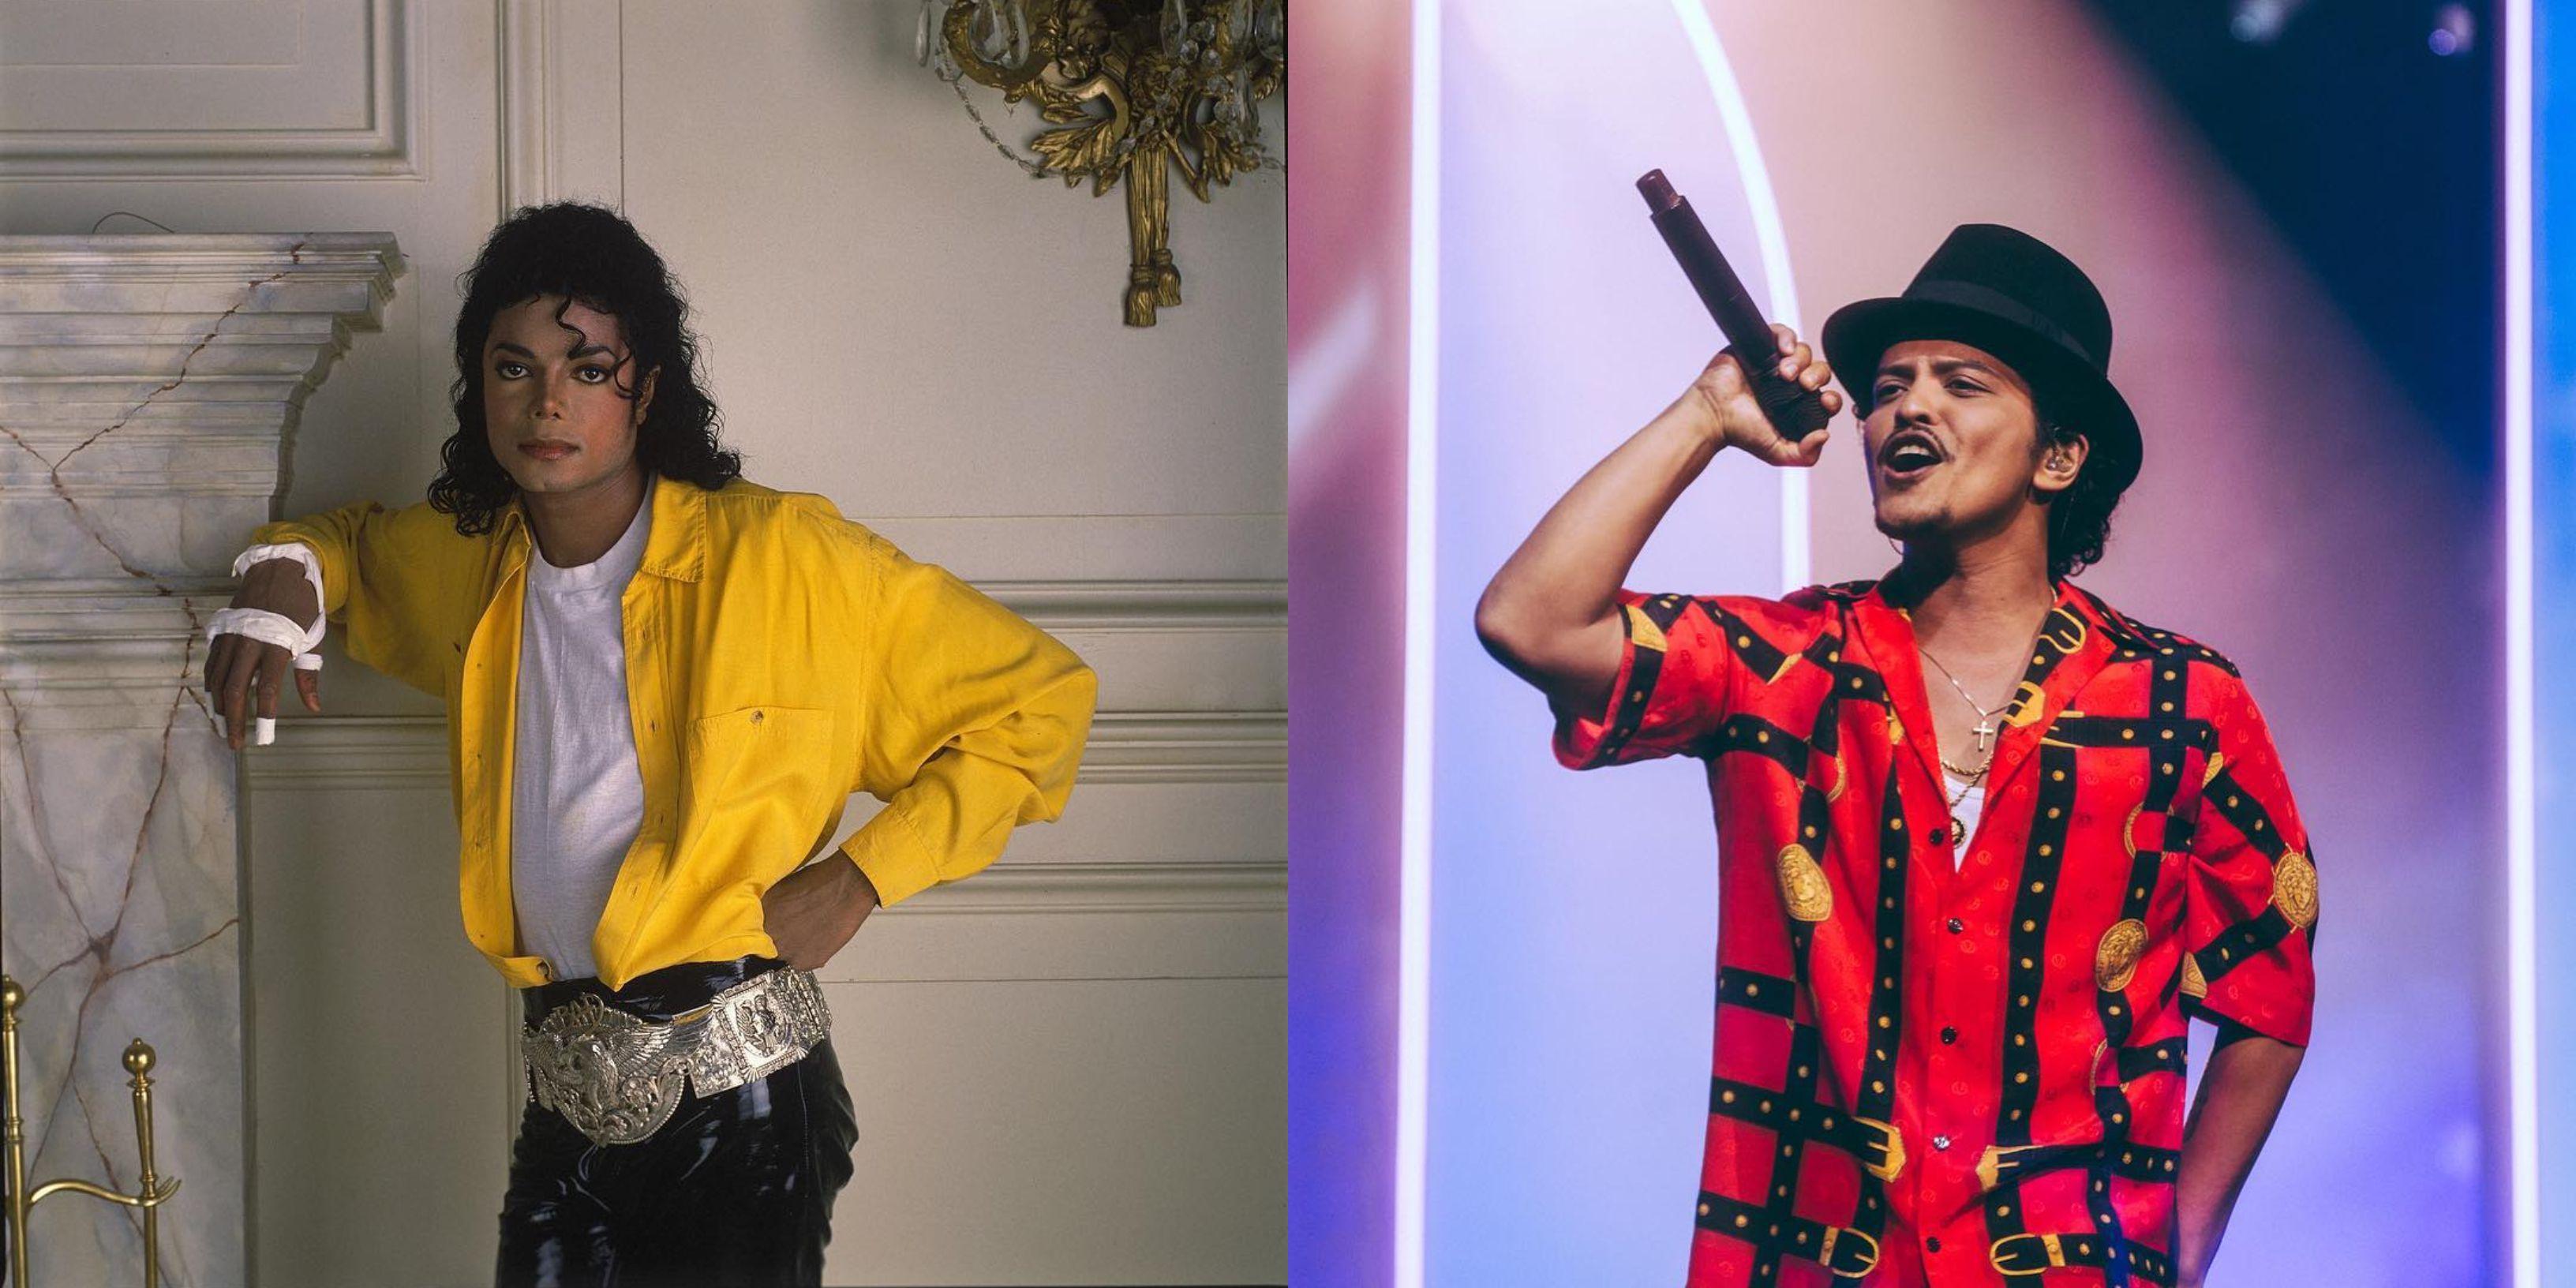 Bruno Mars y Michael Jackson (Foto: Instagram@michaeljackson/@brunomars)